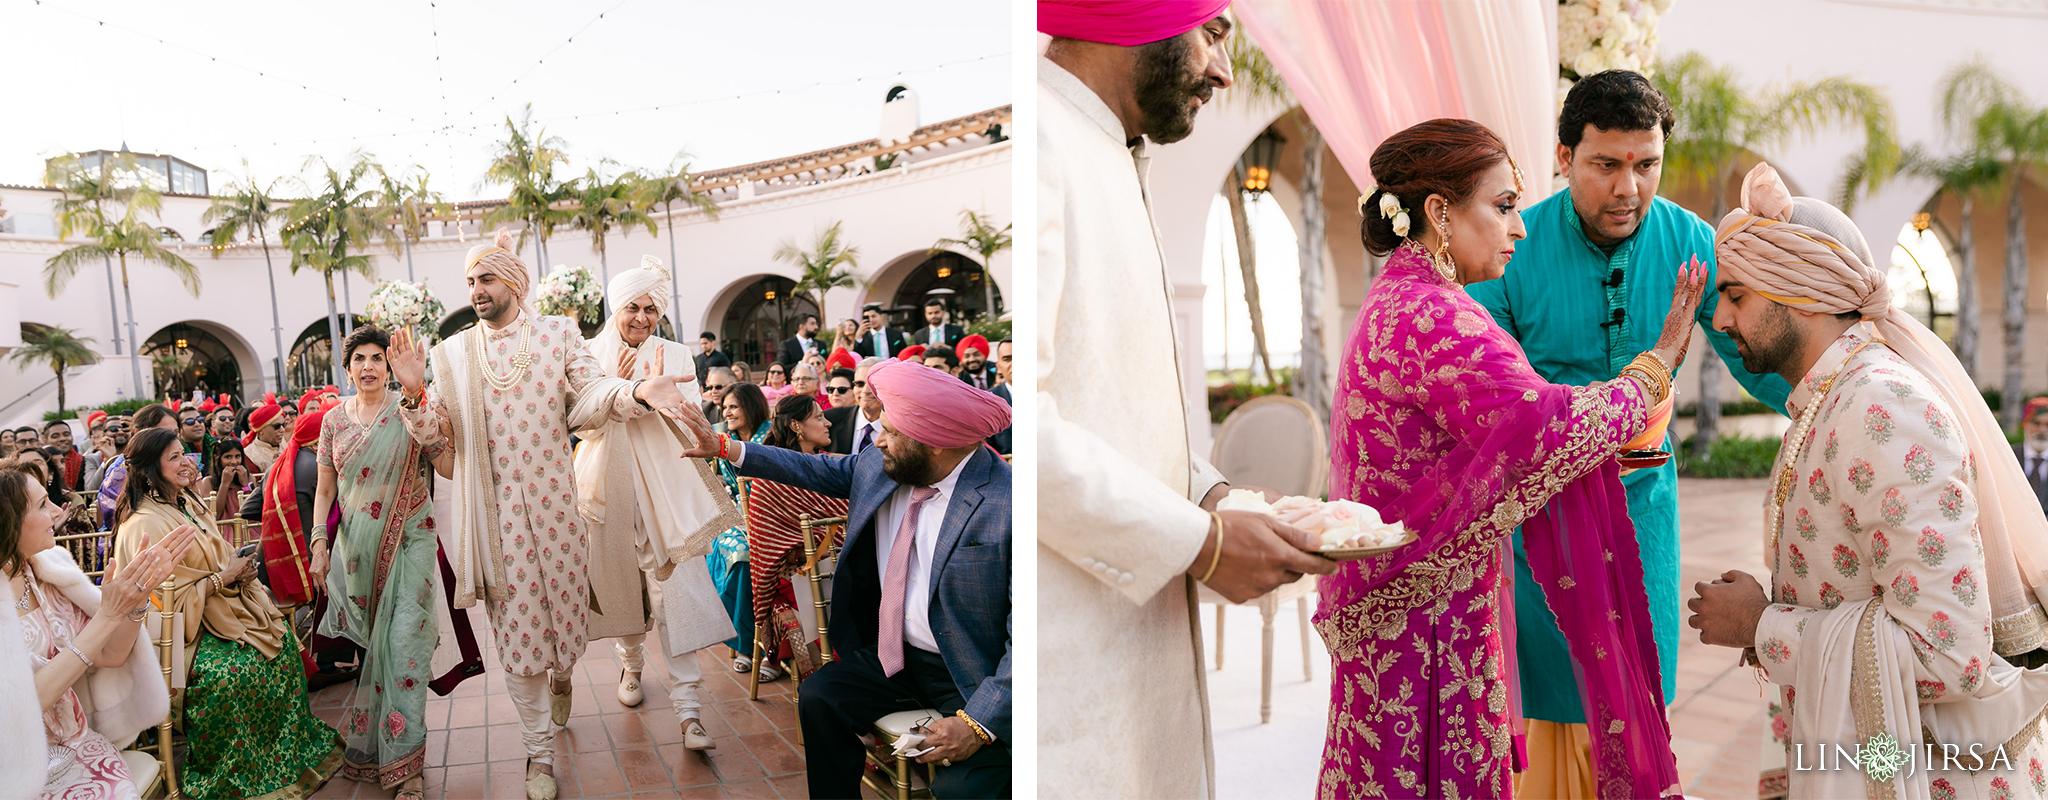 47 Hilton Santa Barbara Beachfront Resort Hindu Wedding Ceremony Photography